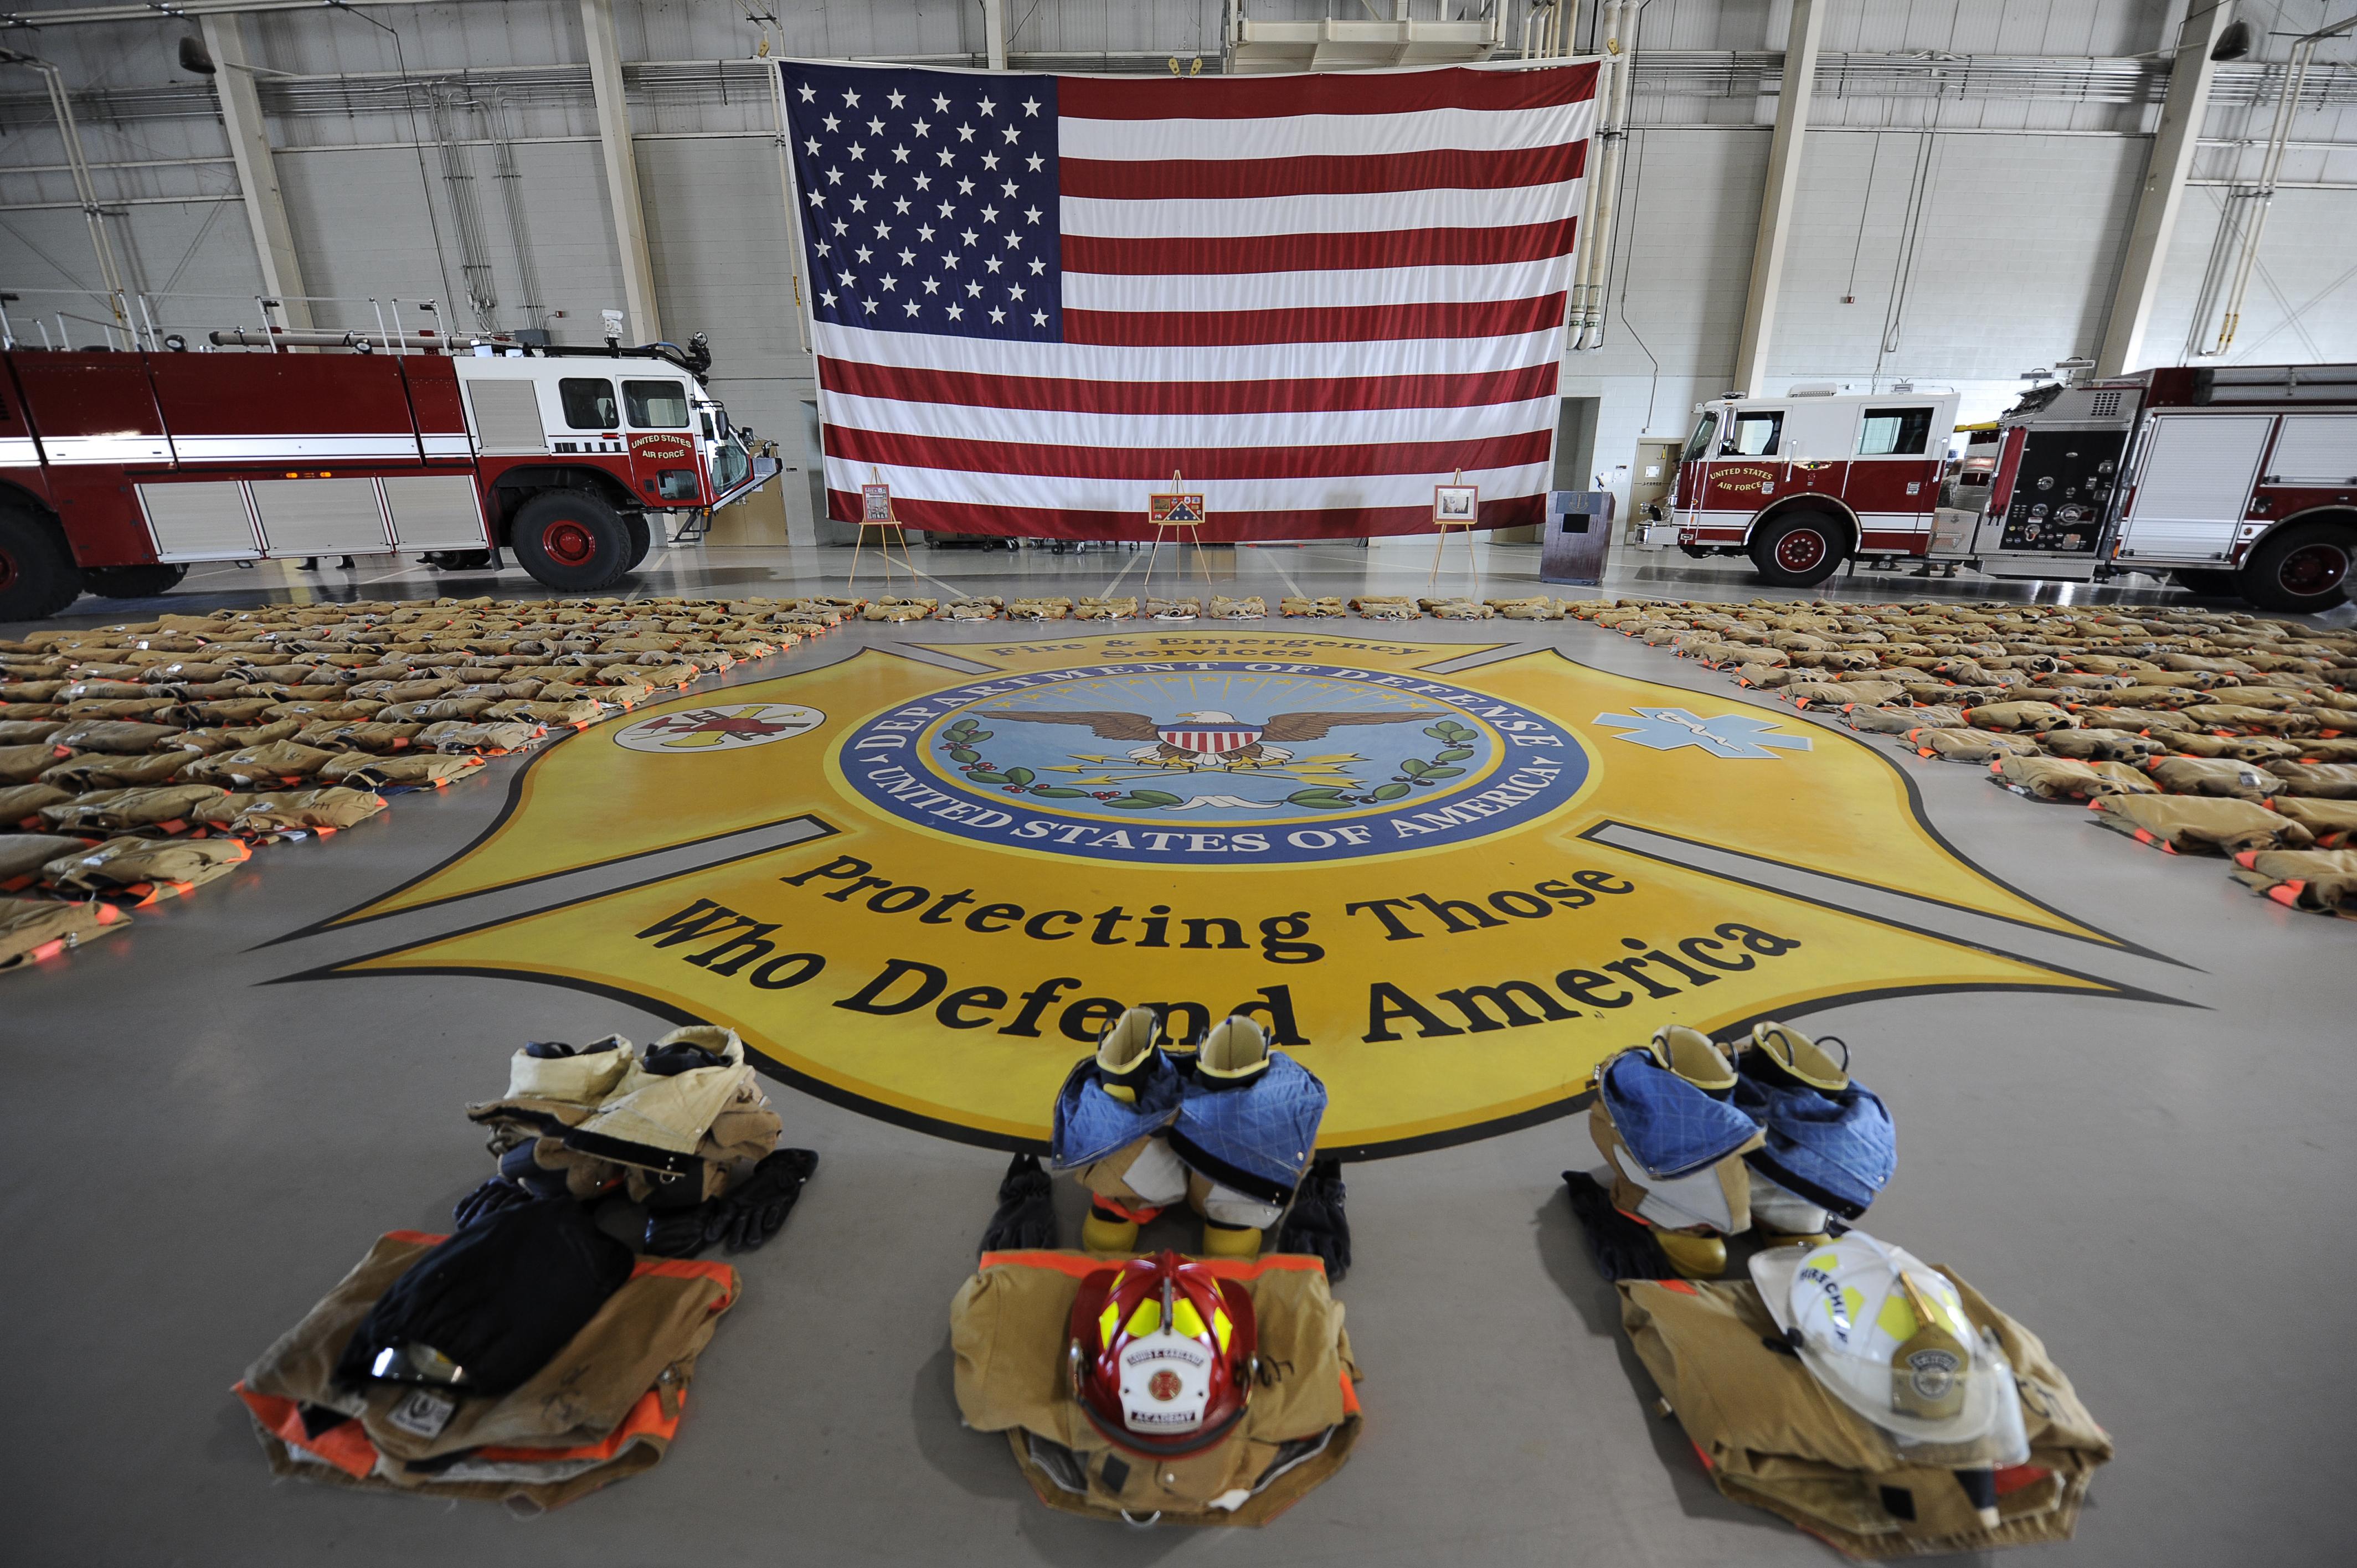 photos goodfellow air force base texas the lois f garland department of defense fire